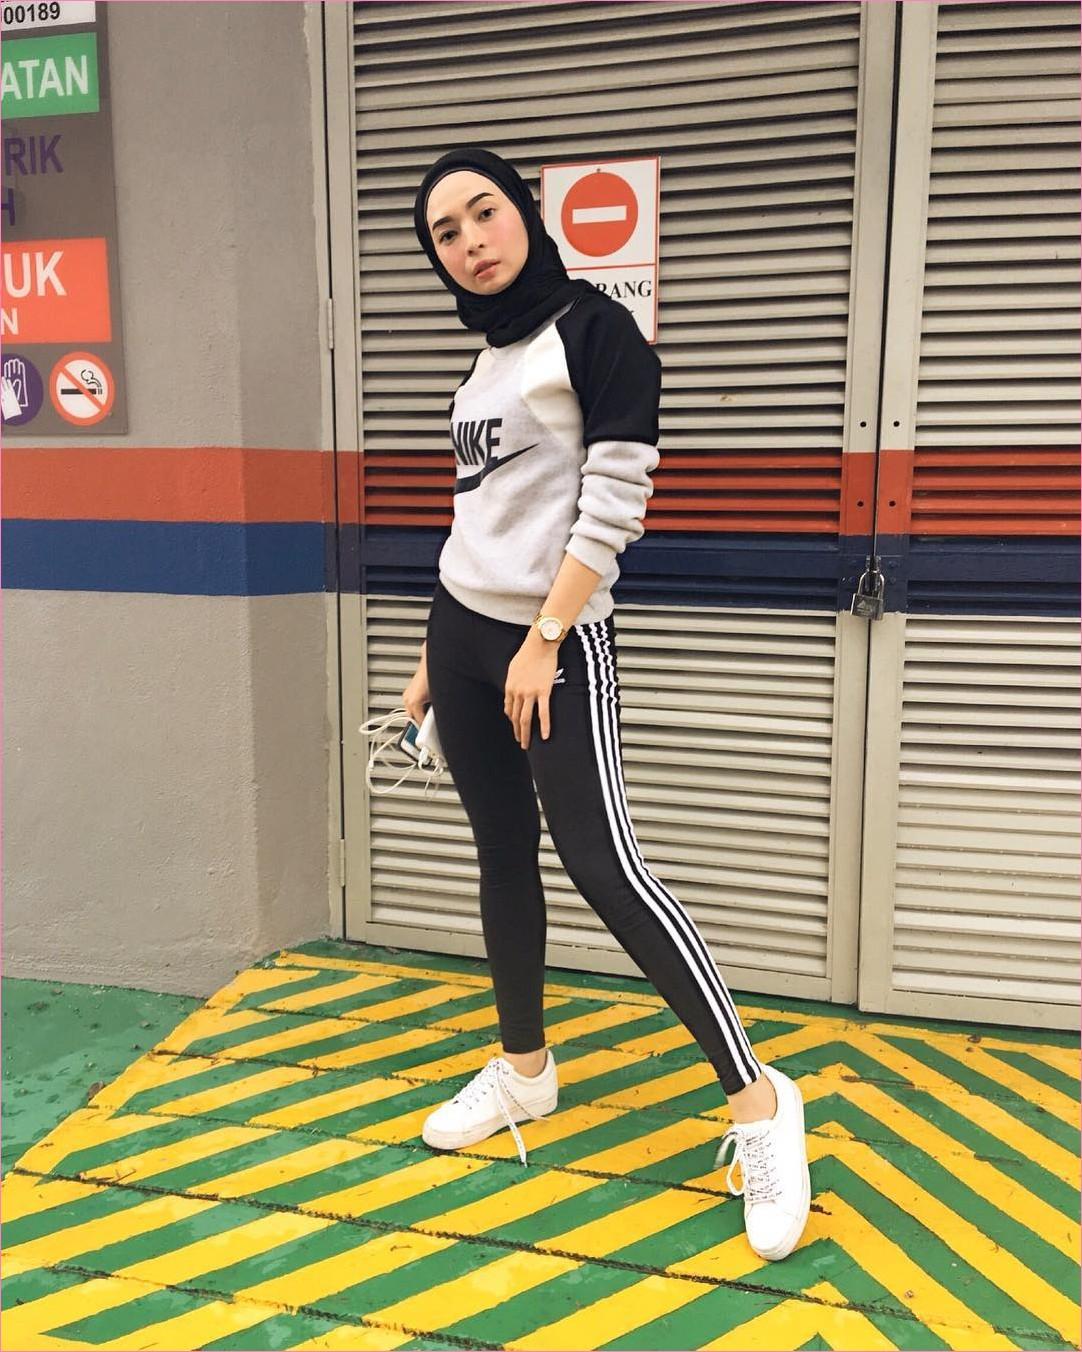 Outfit Baju Hijab Casual Untuk Olahraga Ala Selebgram 2018 hijab pashmina jaket sweater legging nike adidas stripe hitam sneakers kets sepatu olahraga putih jam tangan krem gaya casual kain katun rayon joggin 2018 handphone power bank pintu abu sedang aspal hijau kuning gembok